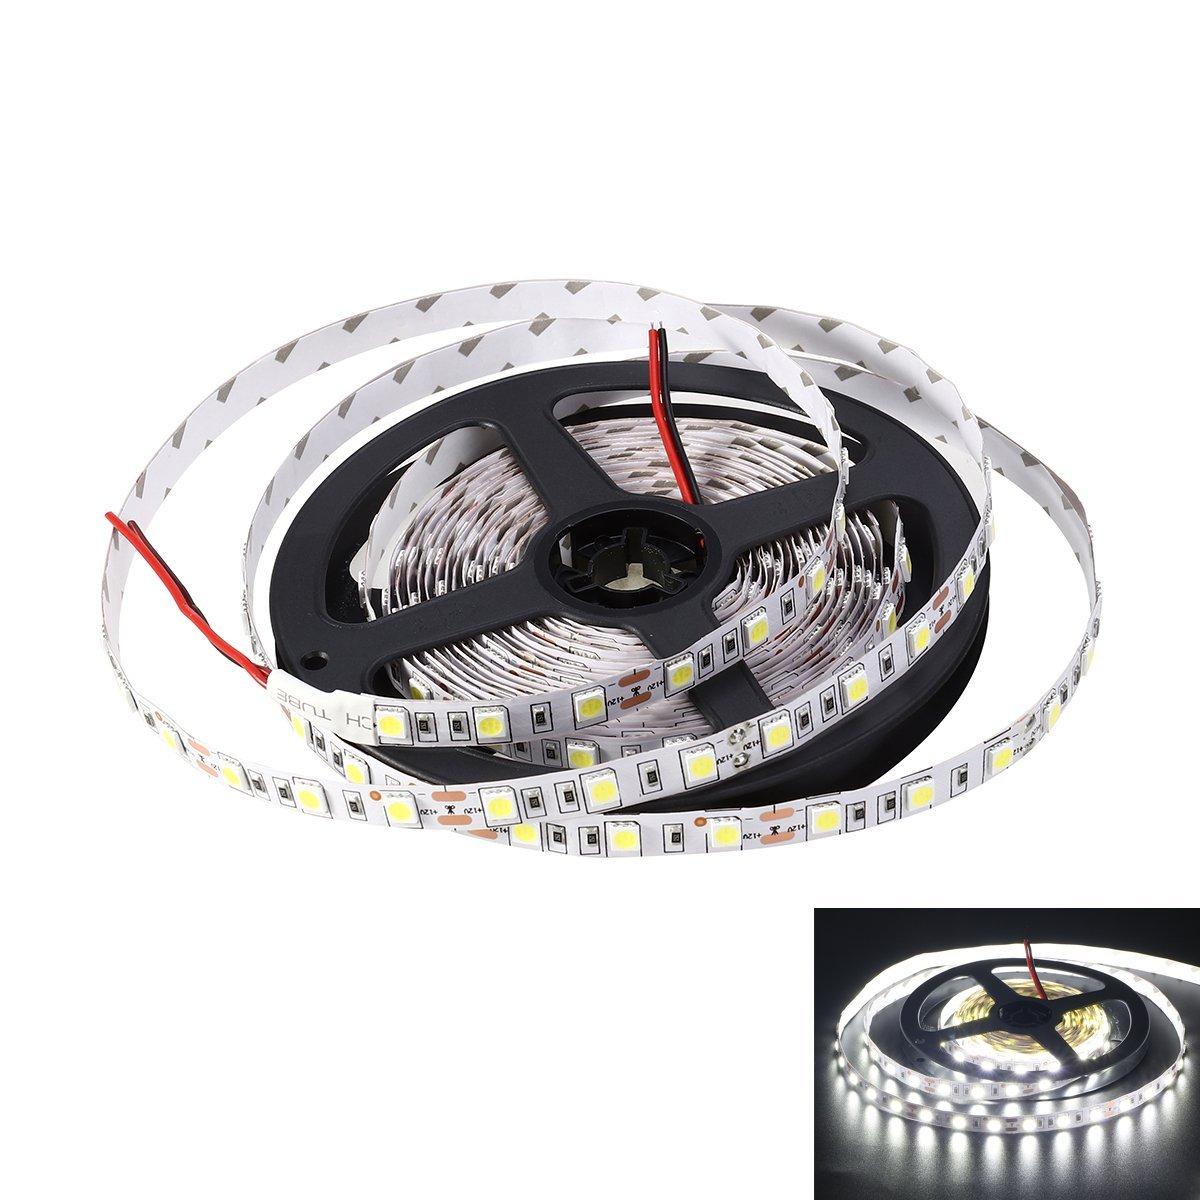 LEDMOMO LED Light Strip, 5M Non-Waterproof Flexible DC 24V 300 SMD 5050 LED Strip Lights Lamp (Pure White)